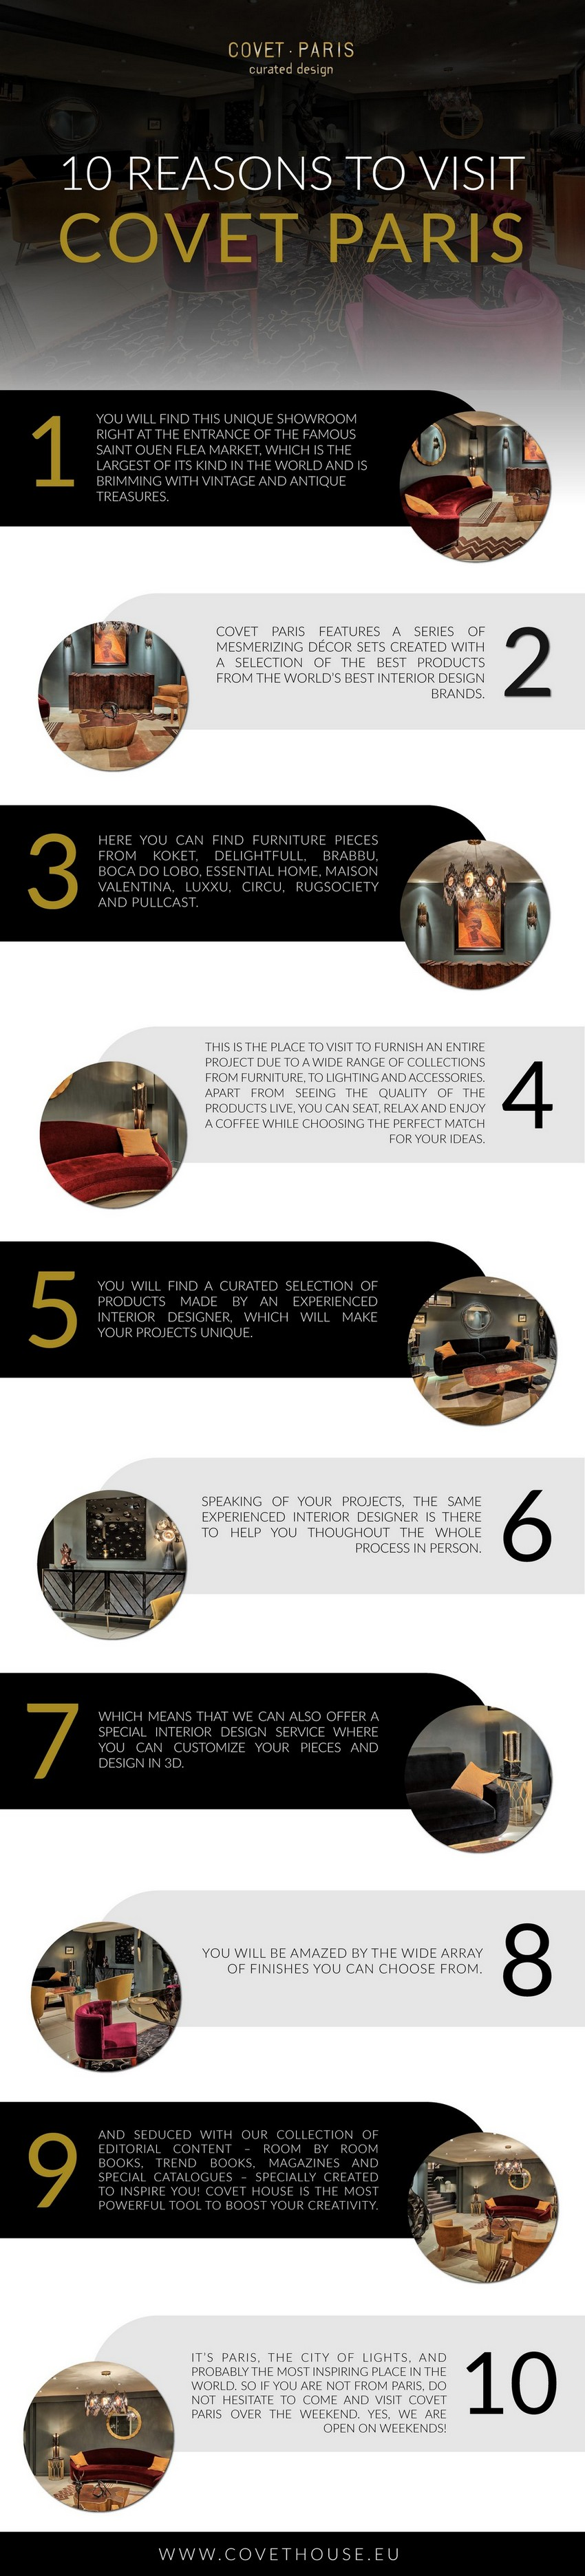 10 Gründen Covet Paris luxuriösen Designraum zu Besuchen luxuriösen designraum 10 Gründen Covet Paris luxuriösen Designraum zu Besuchen 10 reasons to Visit Covet Paris